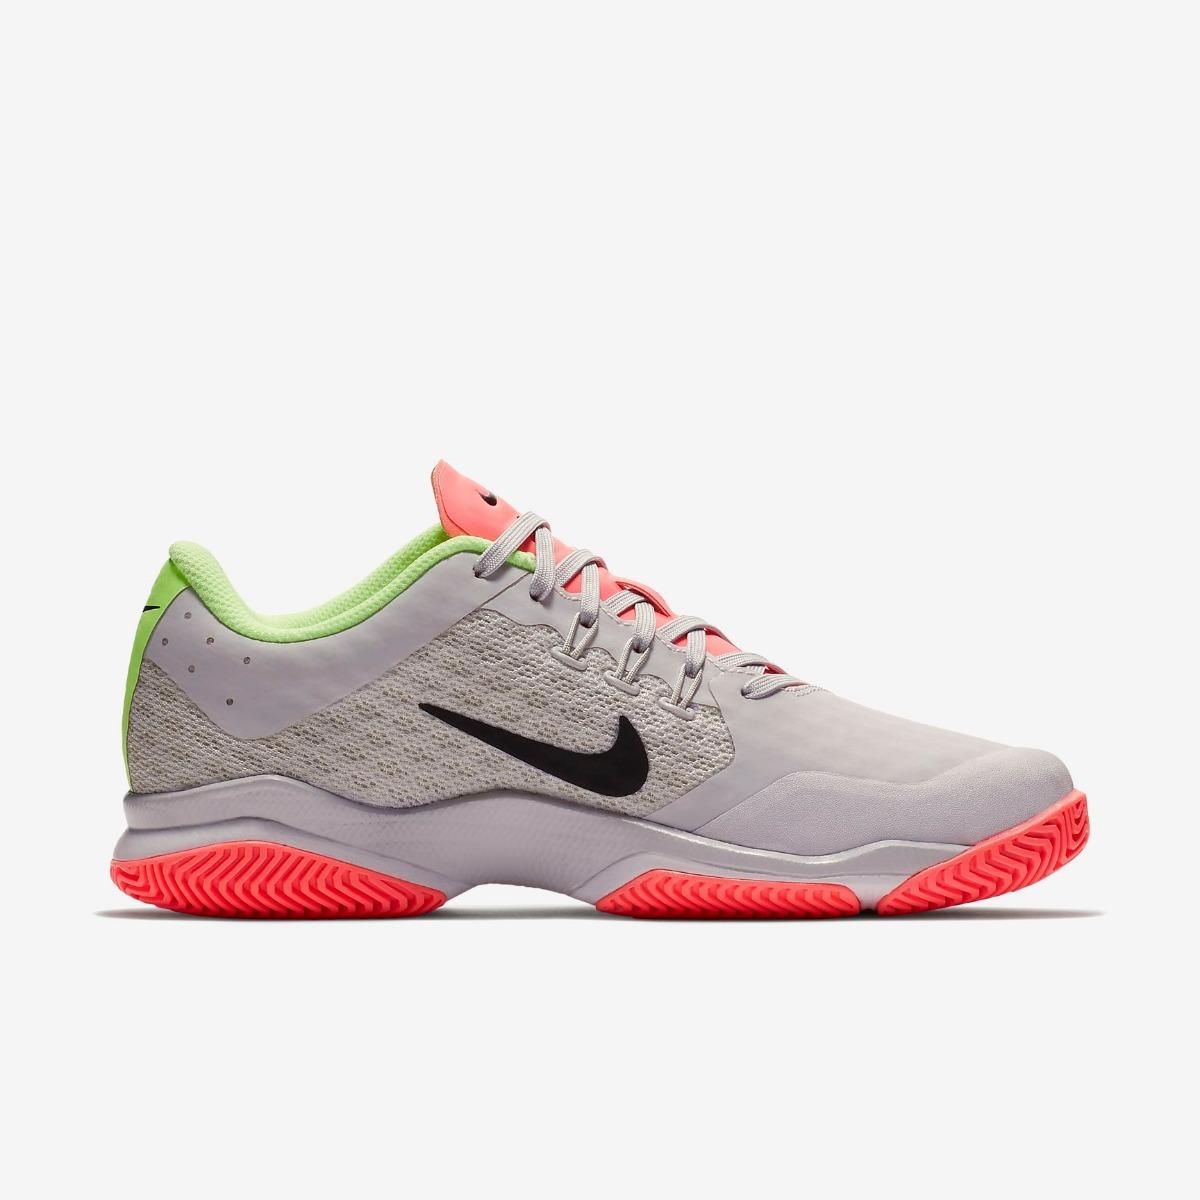 08b95765213eb Zapatos Para Jugar Tenis Nike Court Air Zoom Ultra Mujer -   549.900 ...